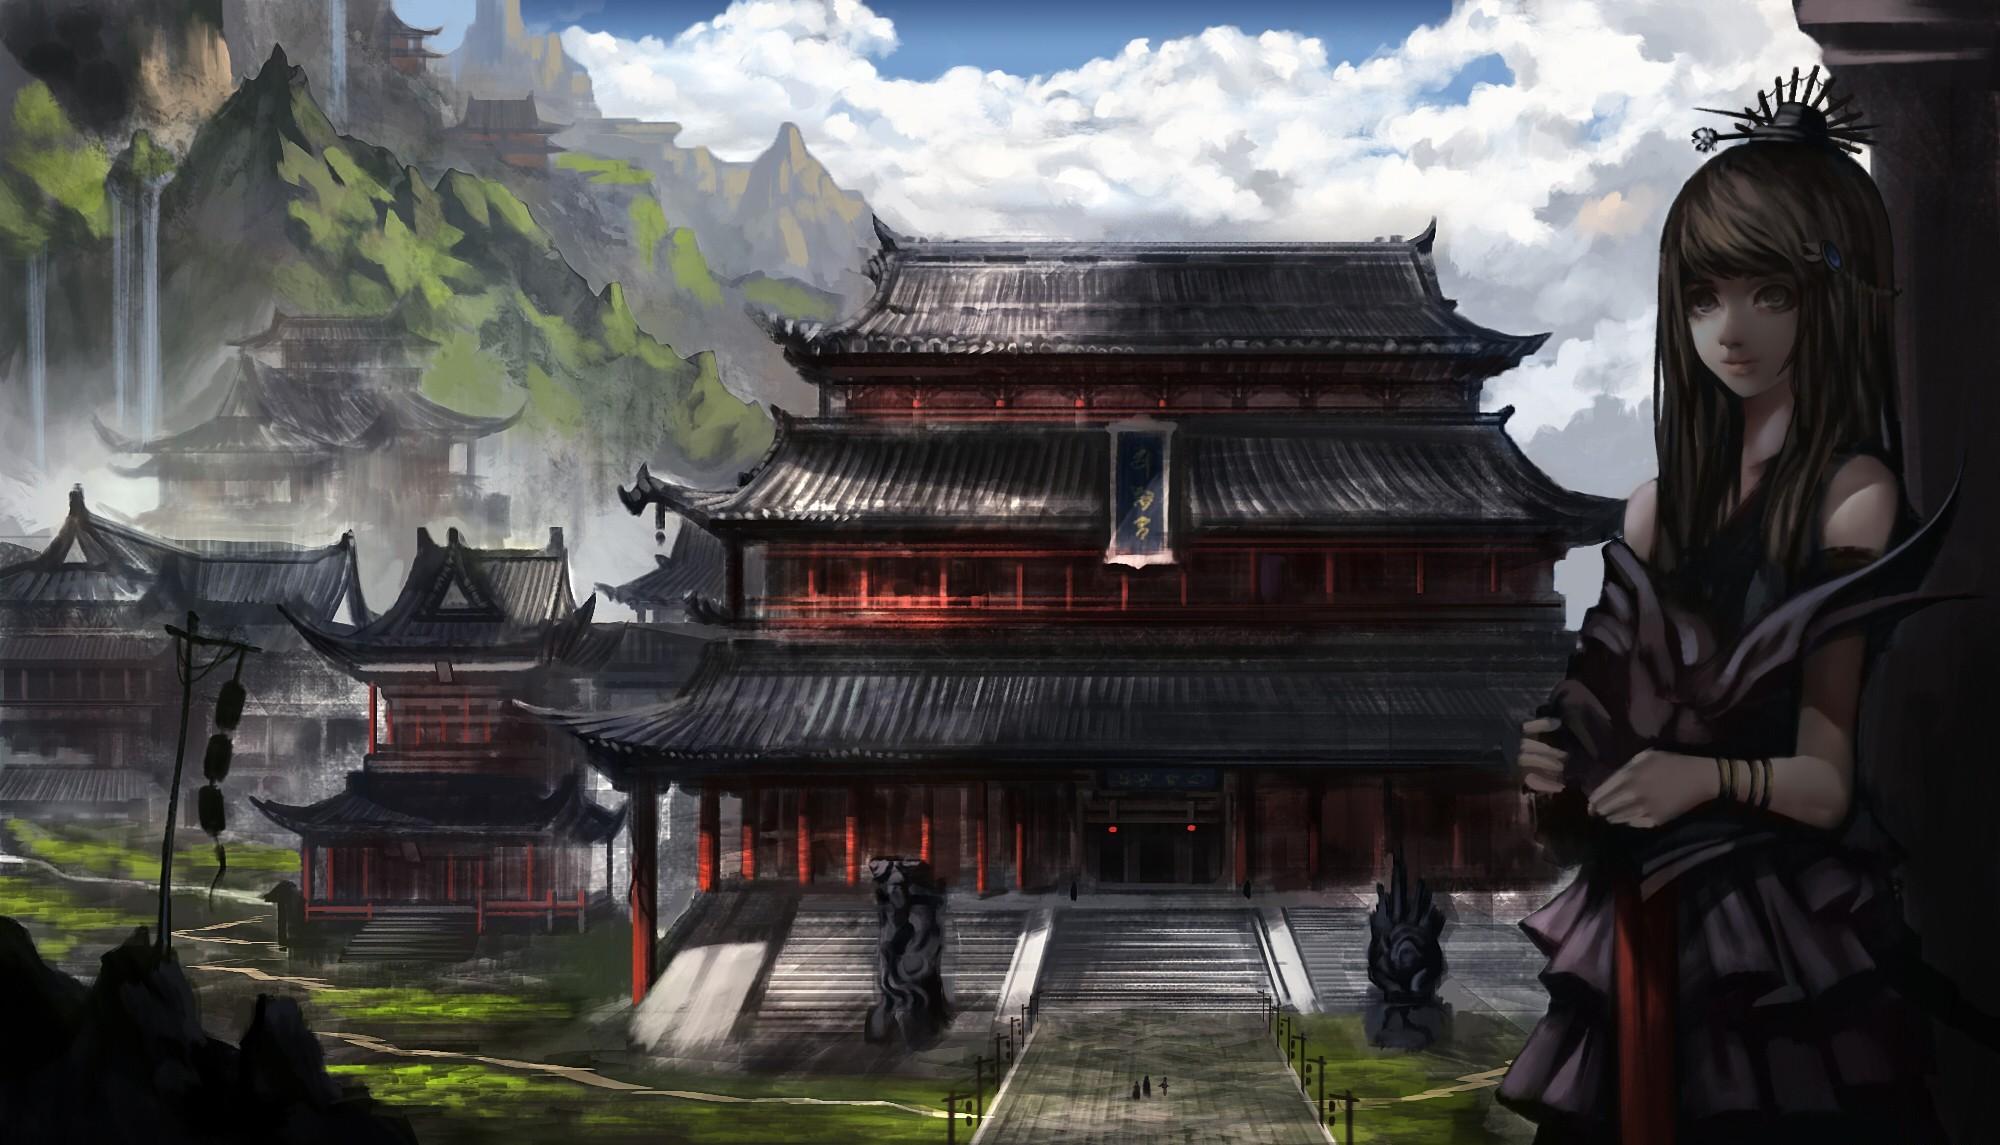 Kitsune Girl Hd Wallpaper Original Hd Wallpaper Background Image 2000x1145 Id